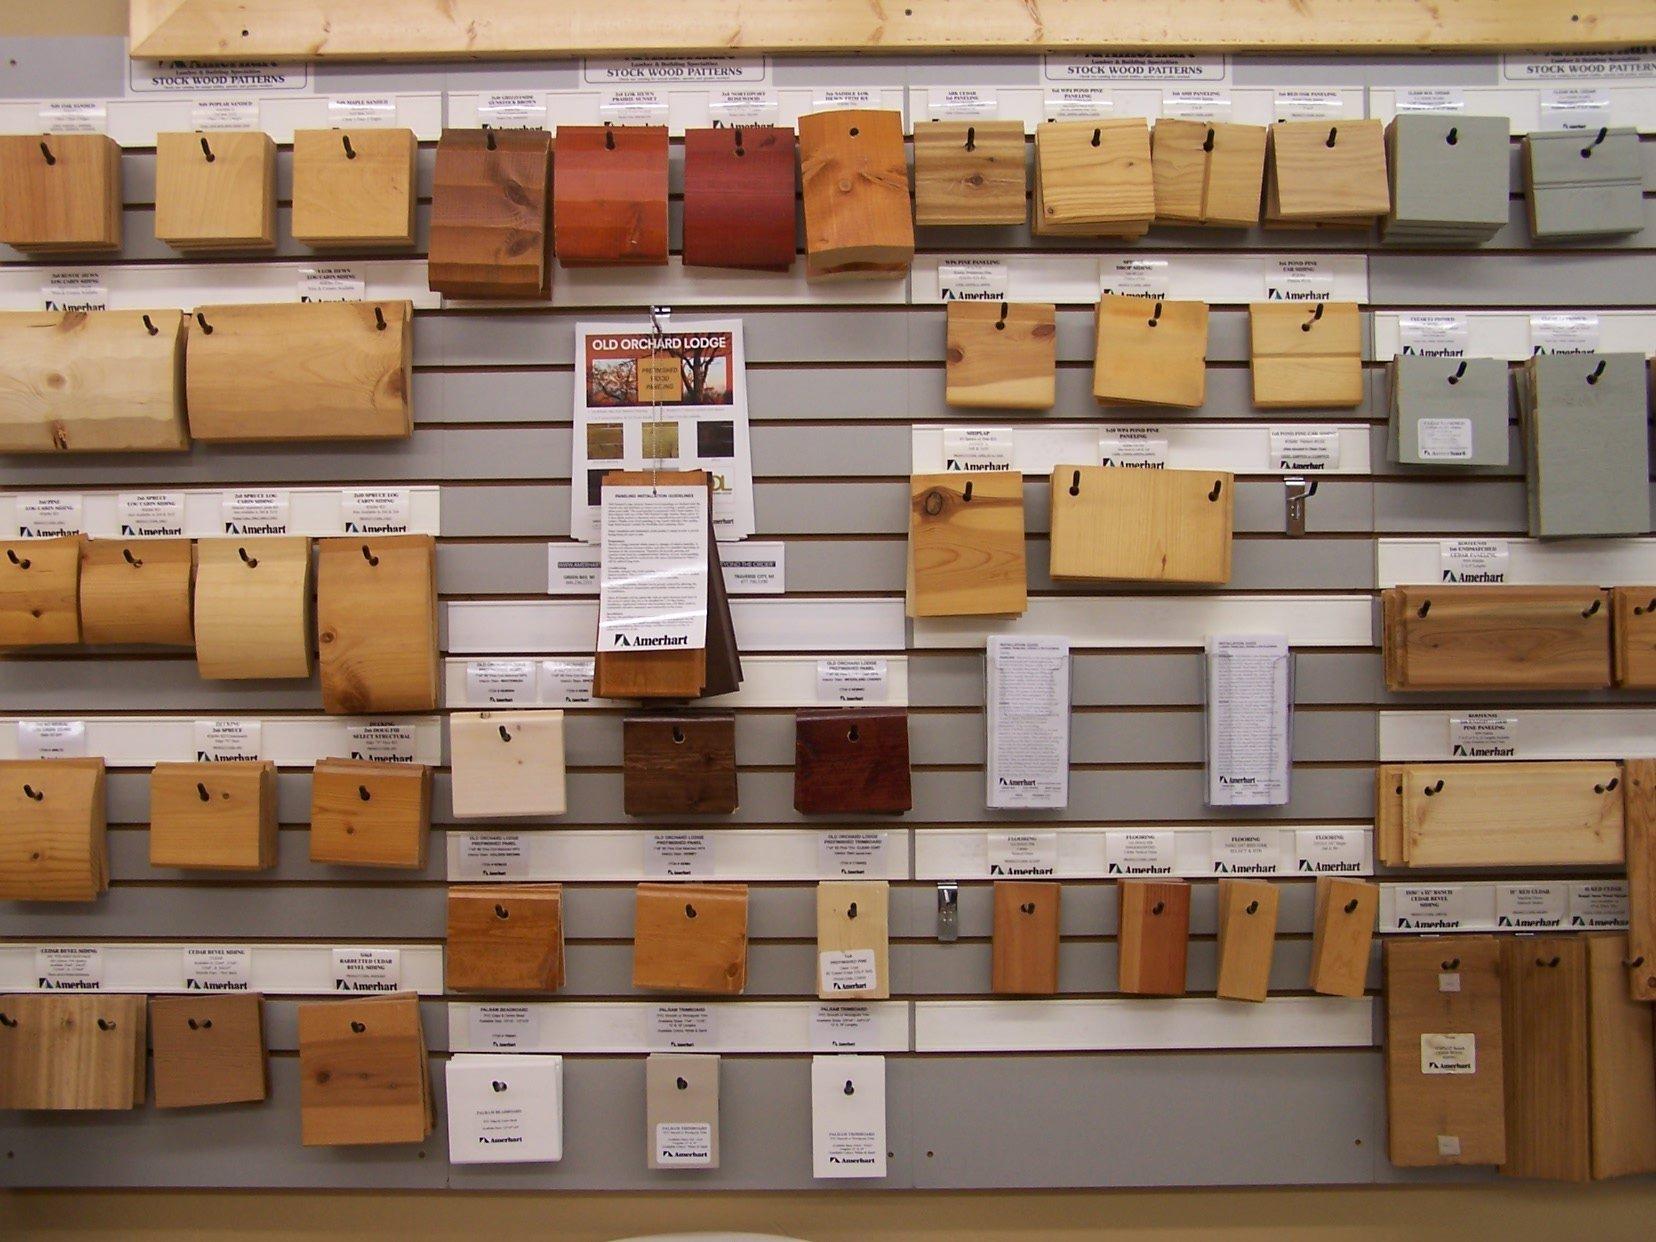 Stock Wood Patterns